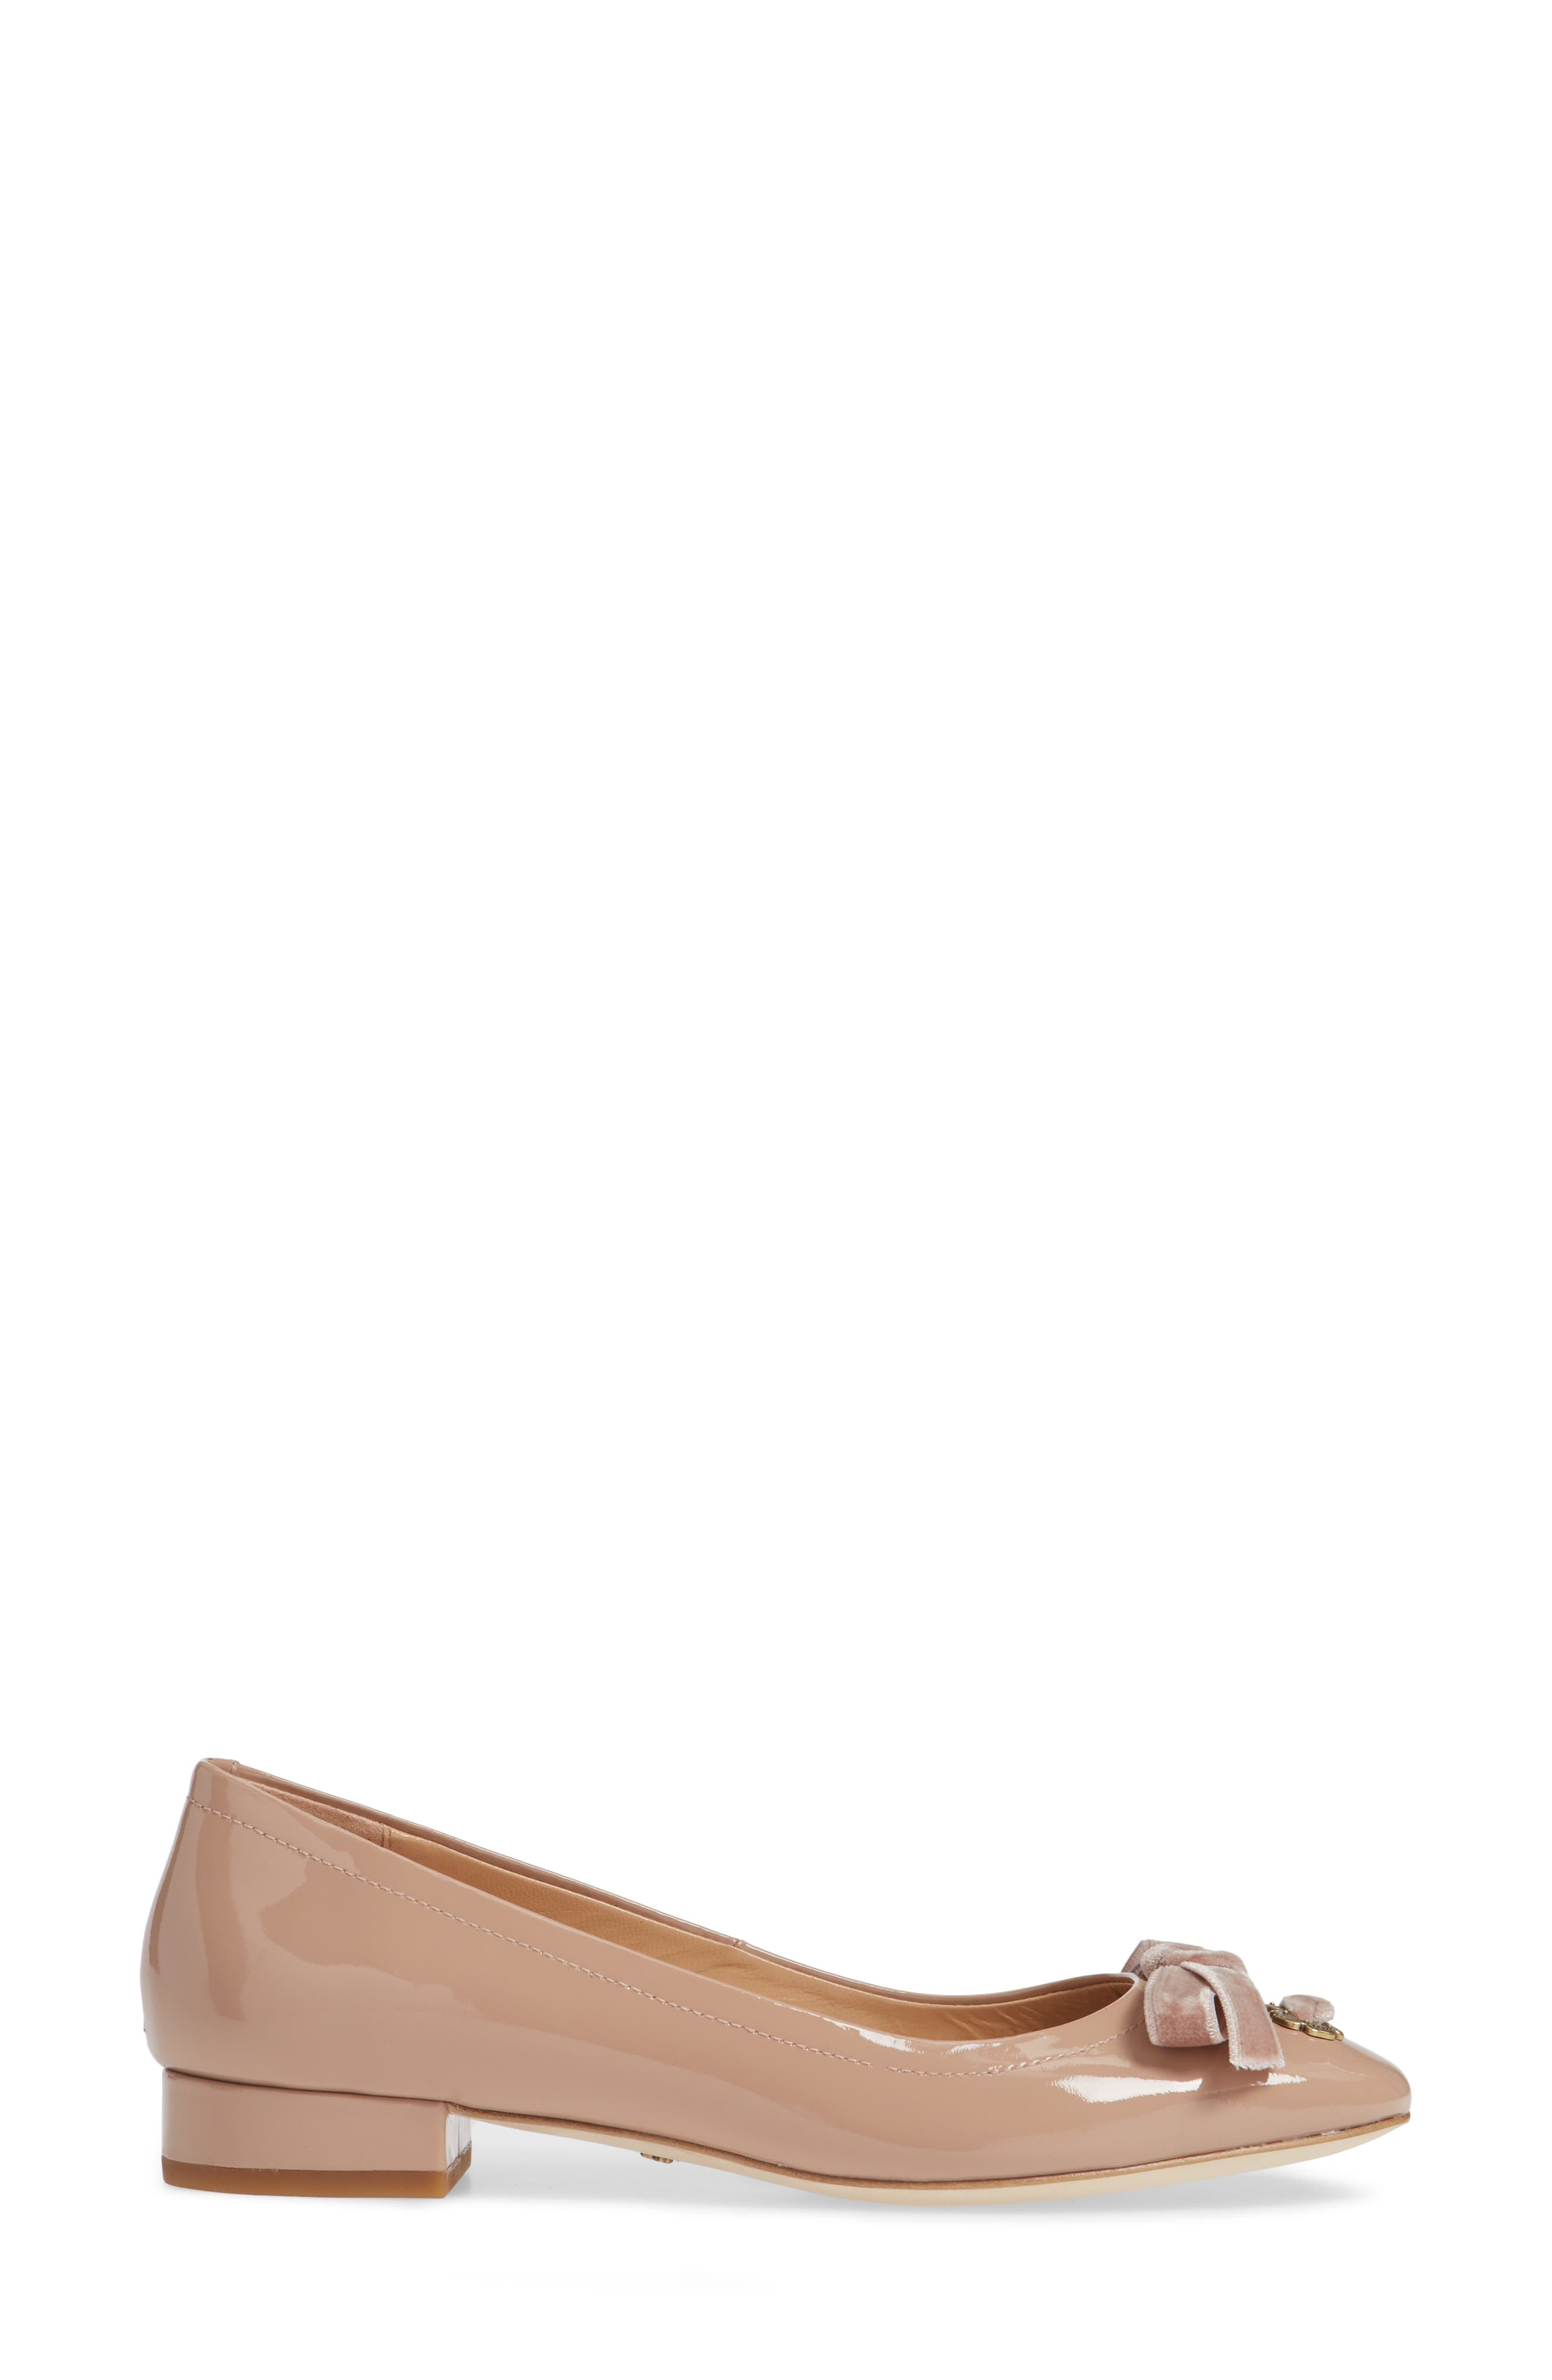 COACH,                             Lia Bow Block Heel Pump,                             Alternate thumbnail 3, color,                             690